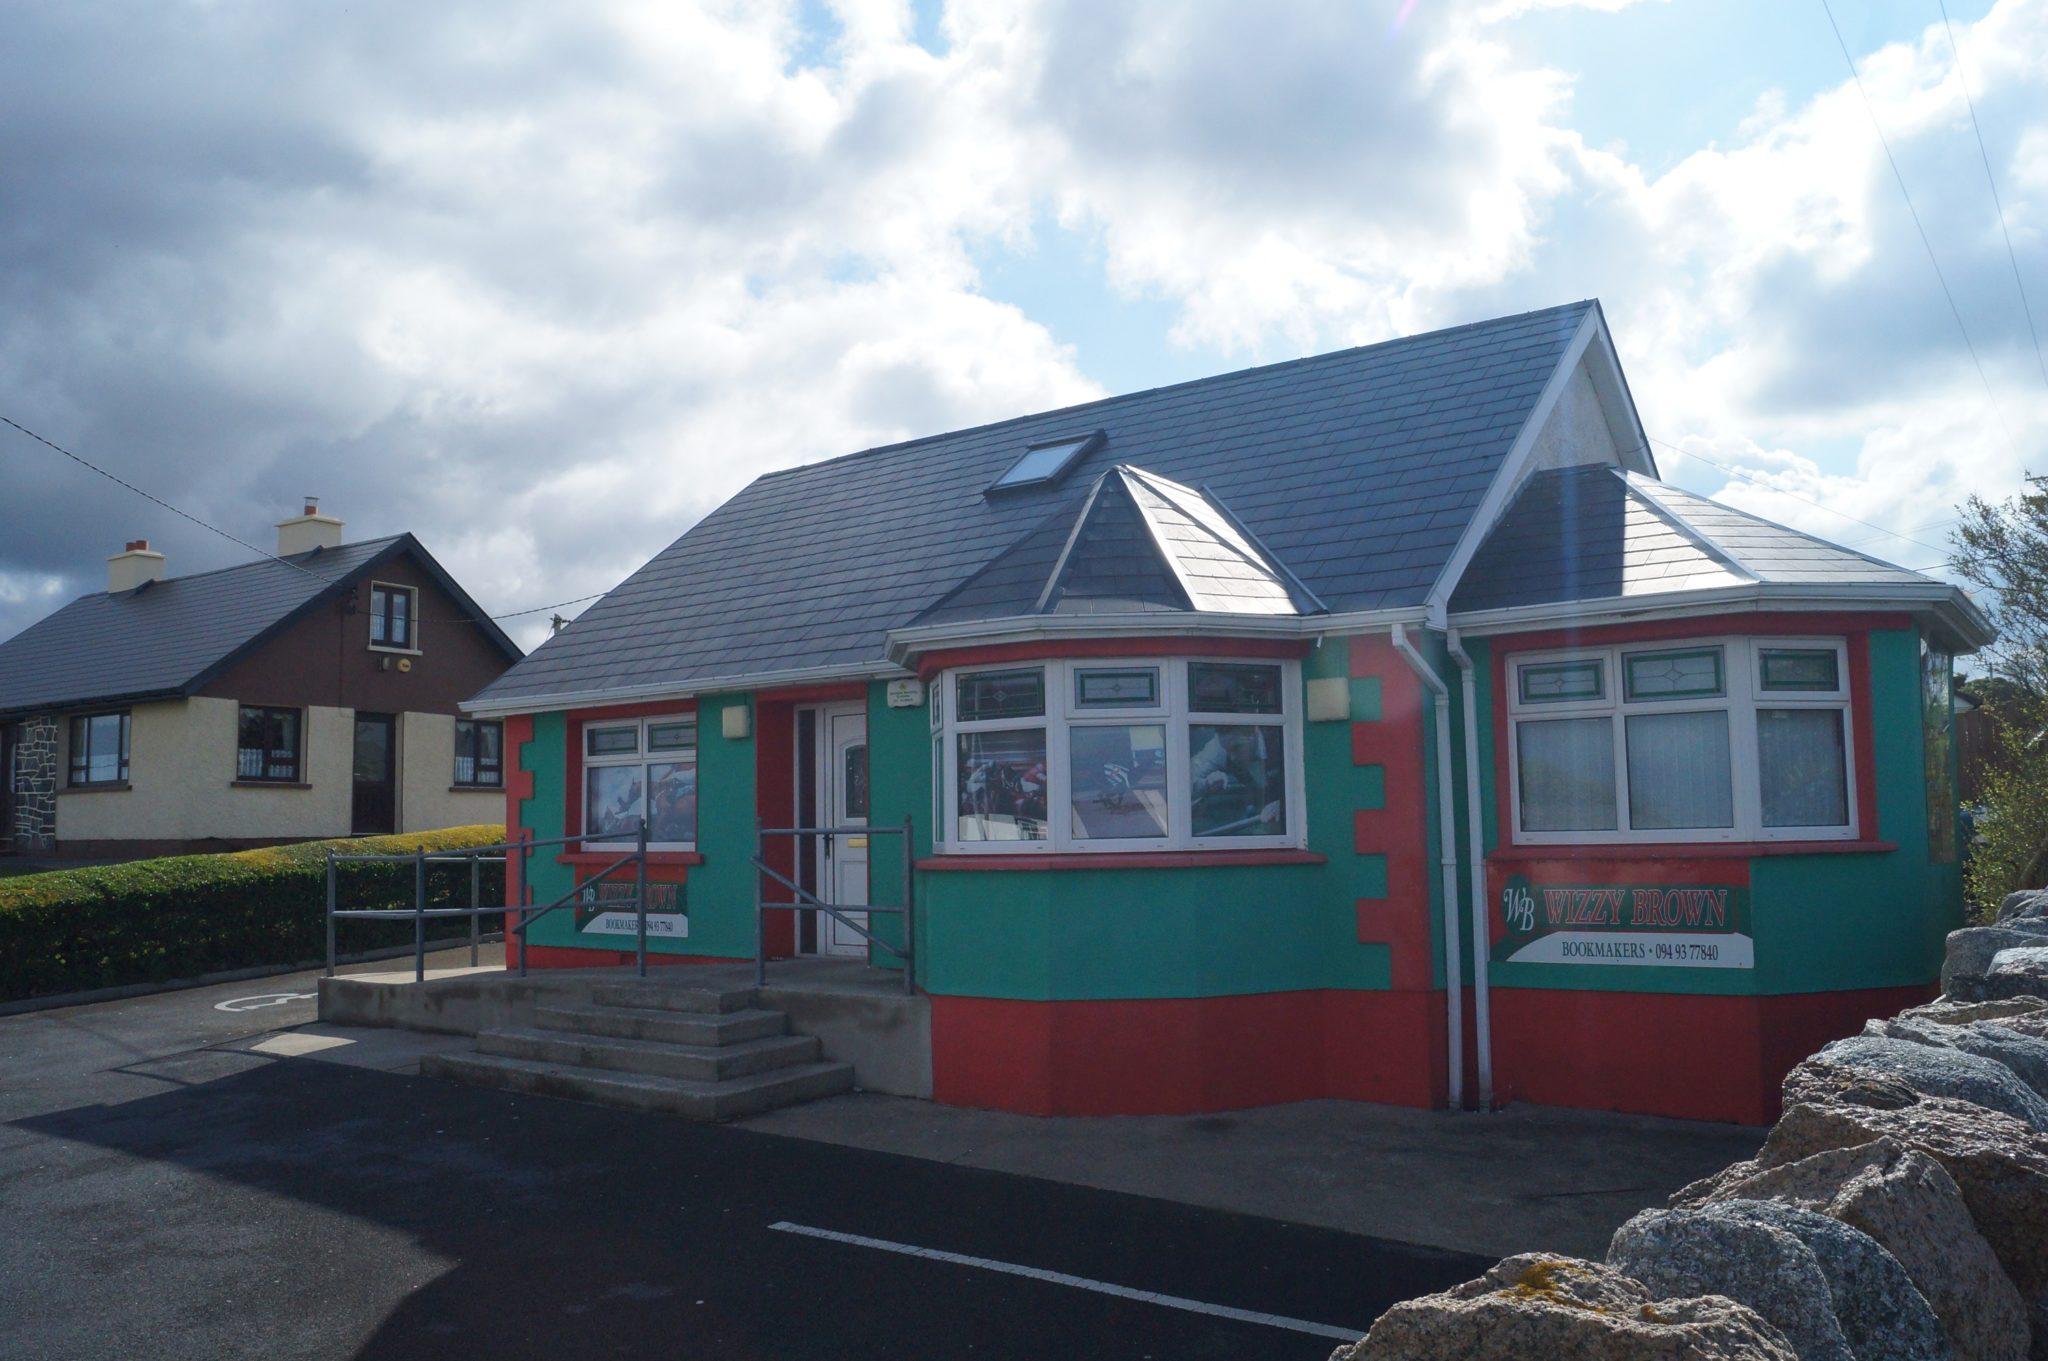 Middletown, Derrybeg, Co. Donegal